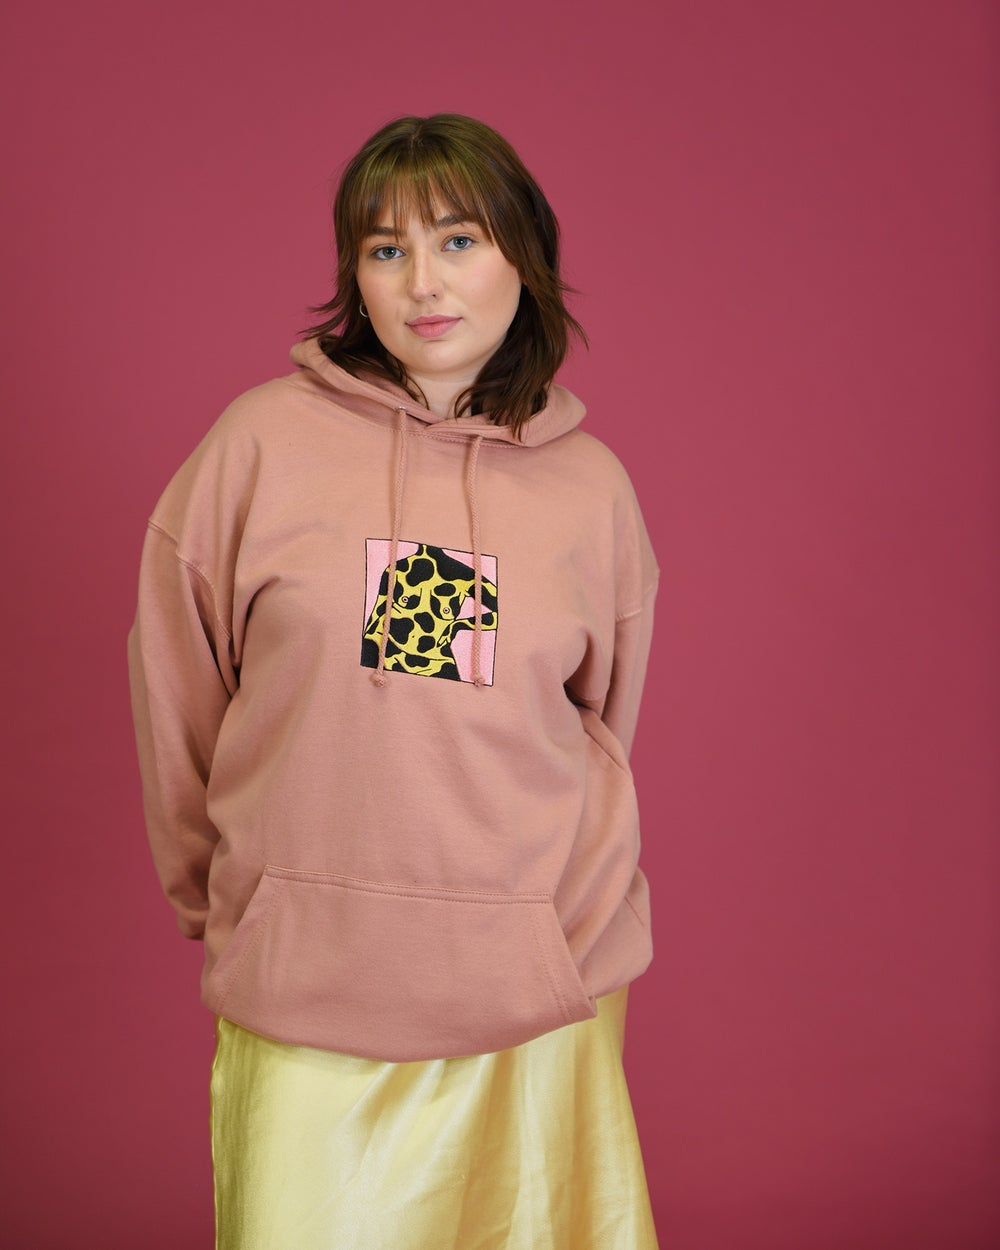 Image of square hoodie